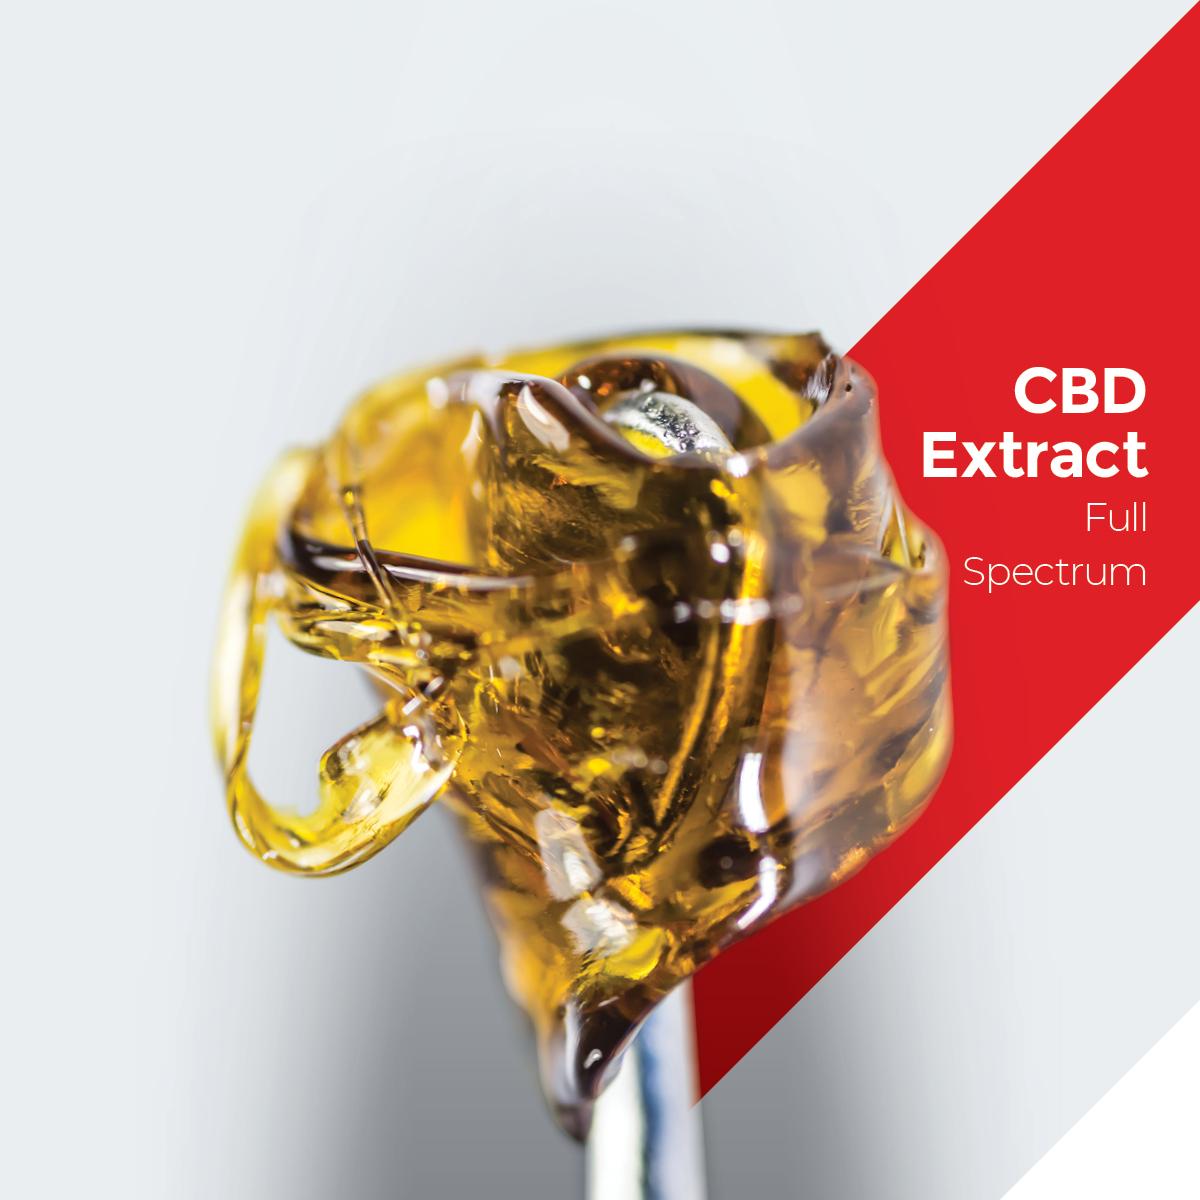 Labocan CBD Extract FULL-Spectrum